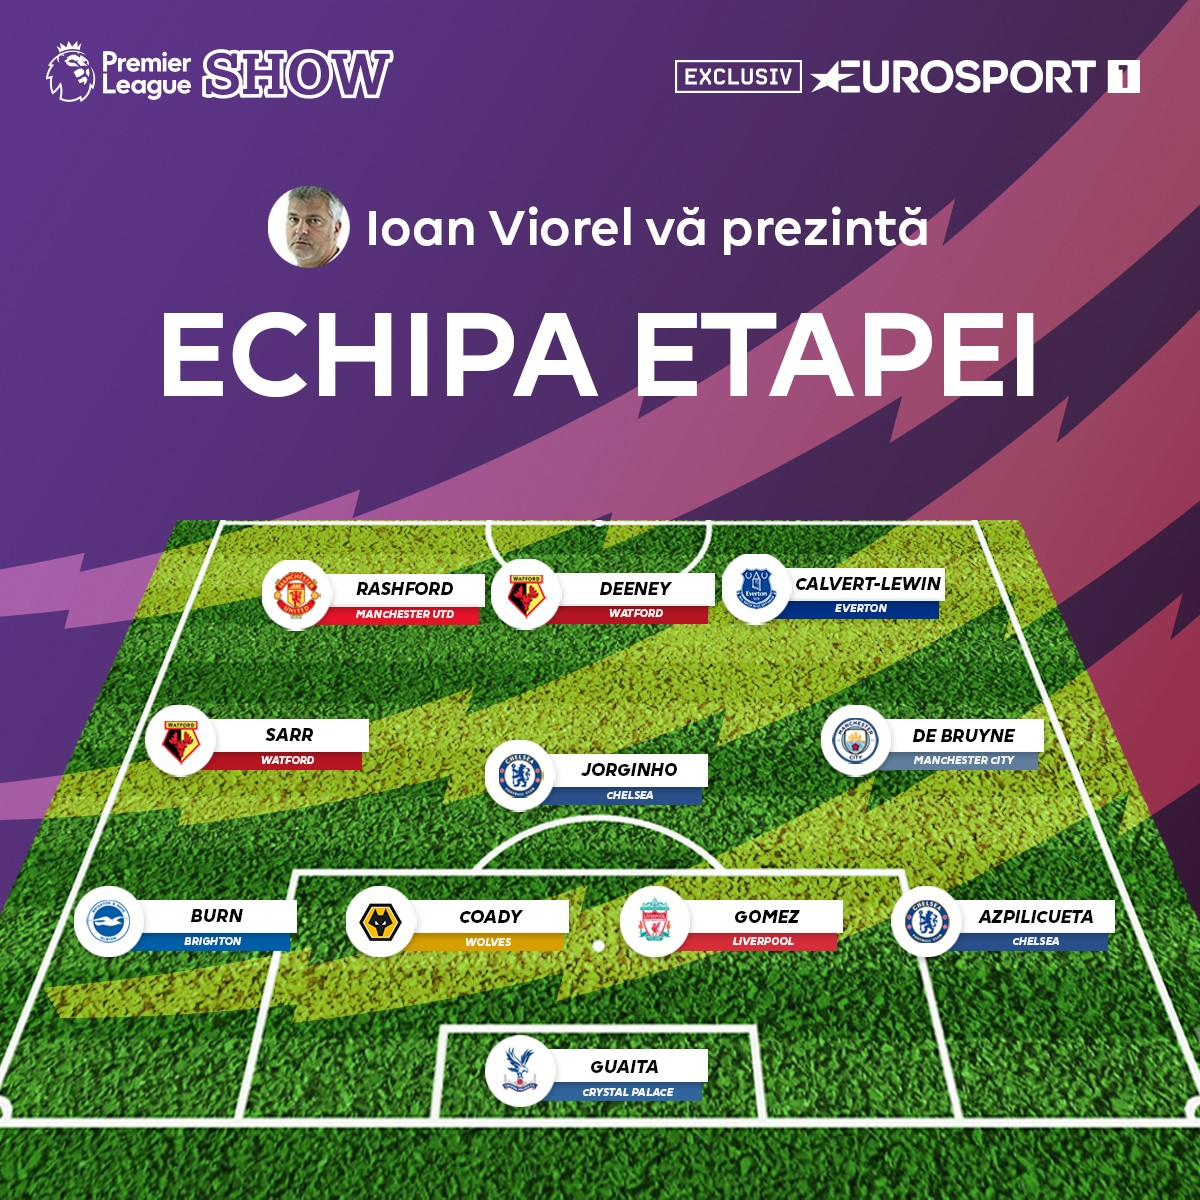 https://i.eurosport.com/2019/12/30/2744166.jpg